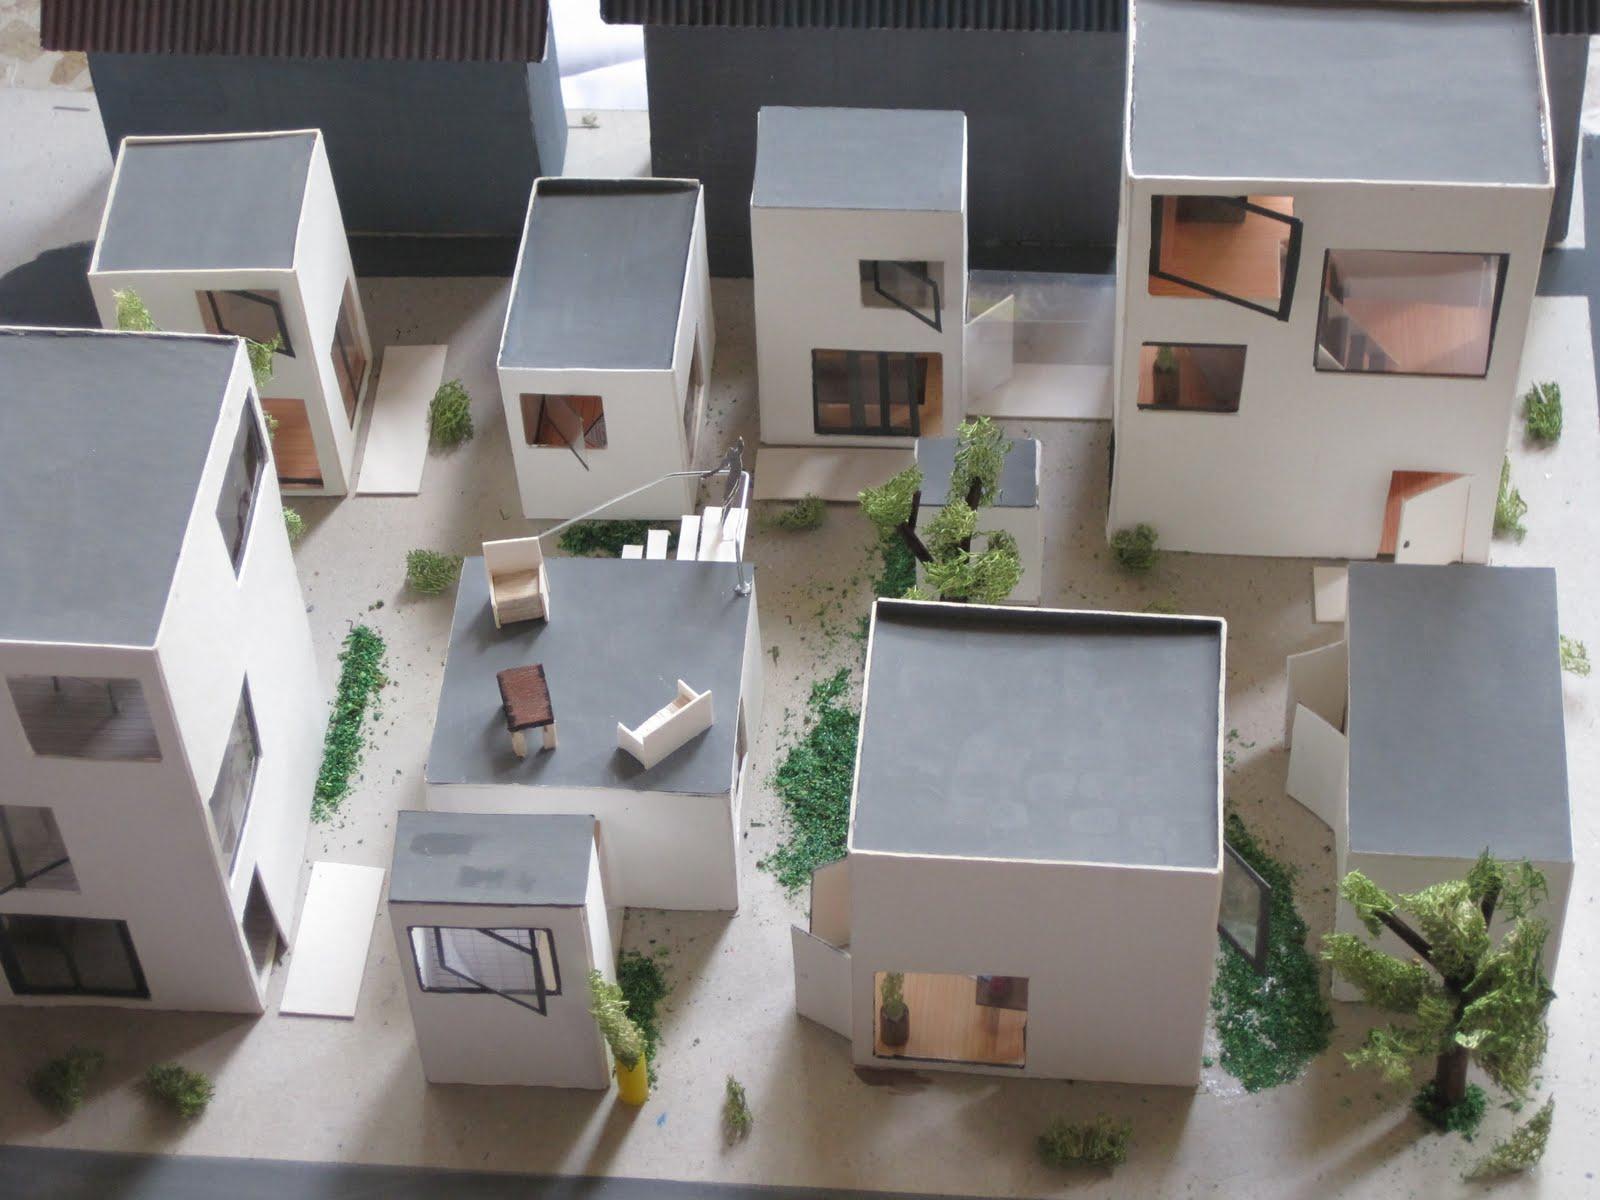 Arquisentidos Moriyama House